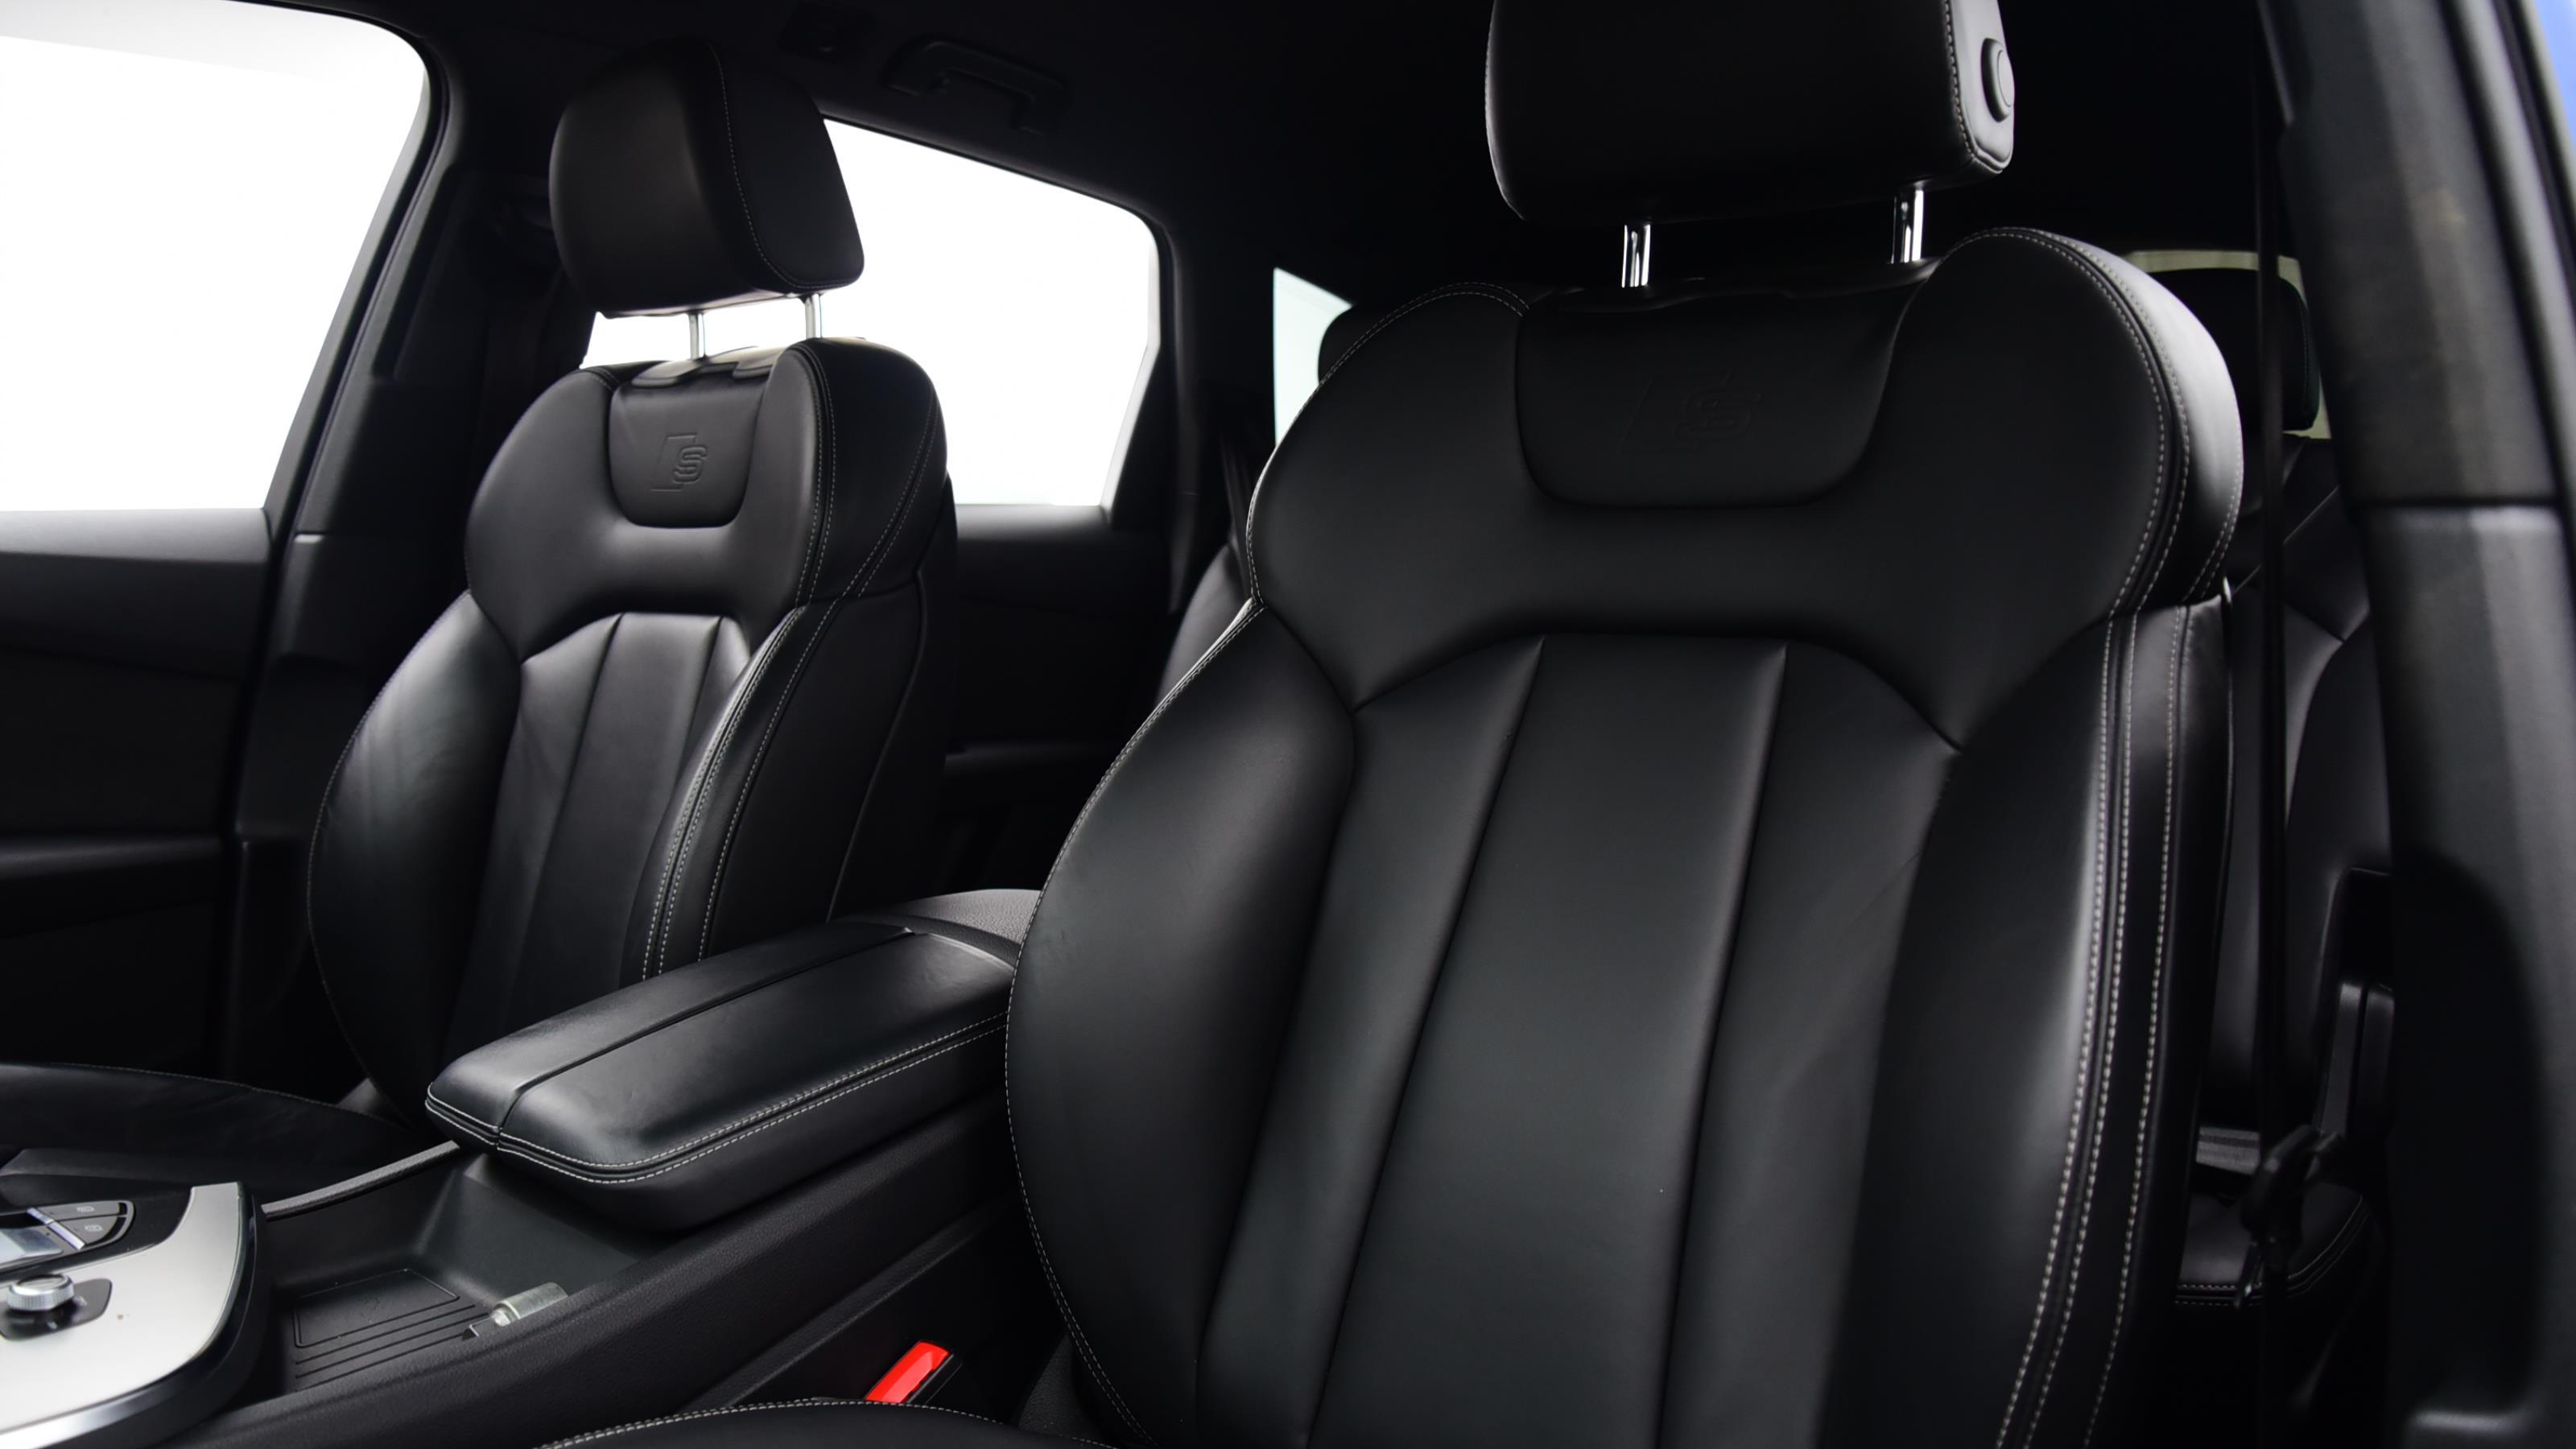 Used 2016 Audi Q7 3.0 TDI Quattro S Line 5dr Tip Auto BLUE at Saxton4x4